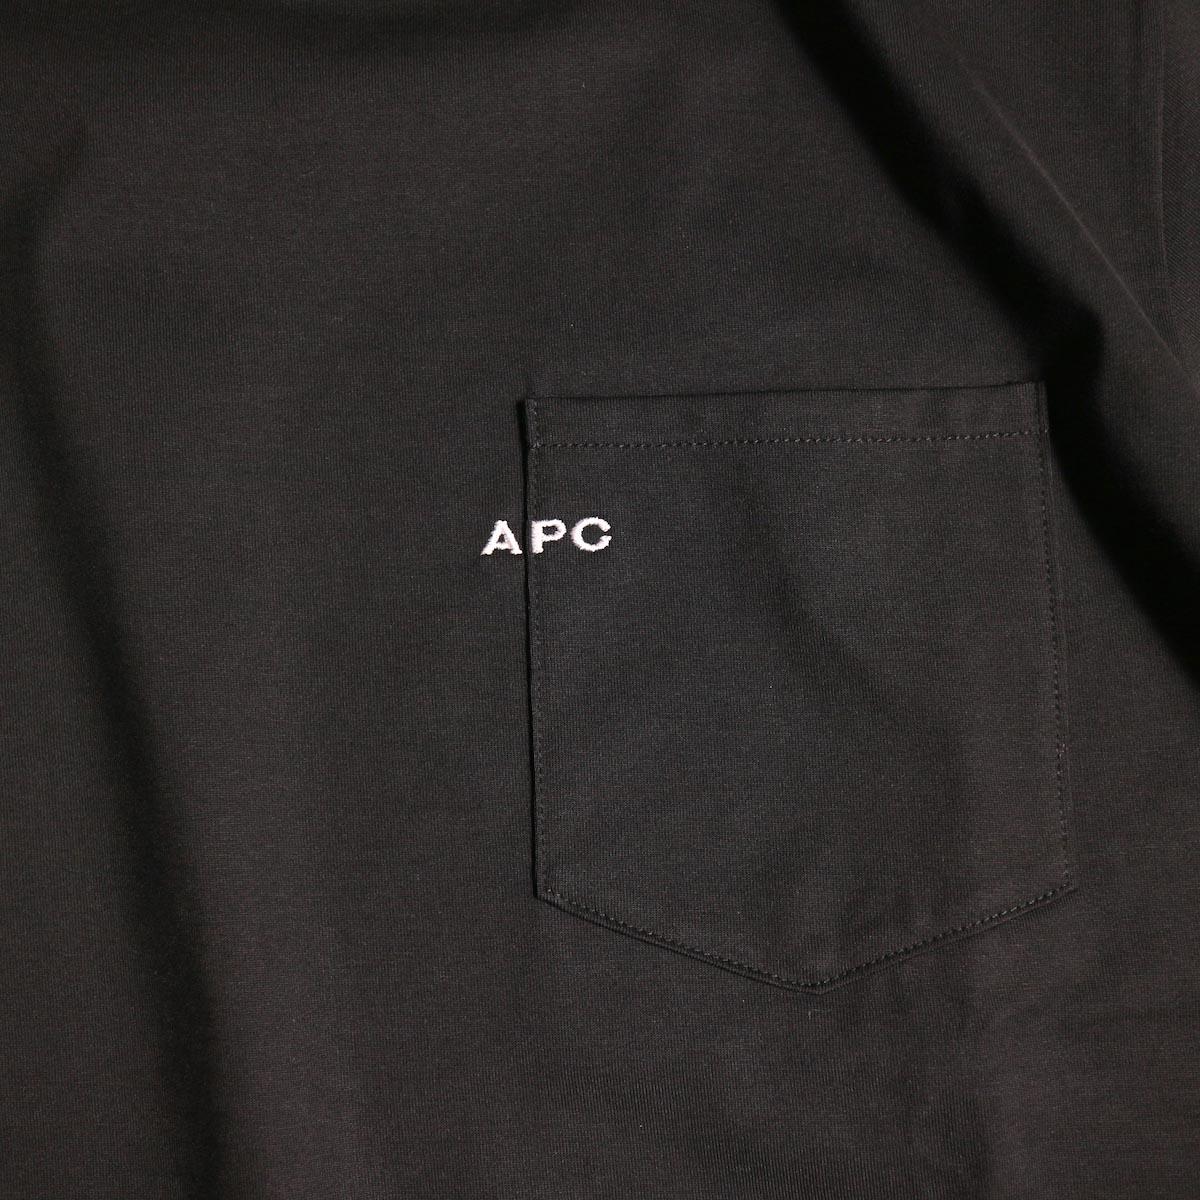 A.P.C. / Crew Neck Emb Pocket Tee -Black刺繍